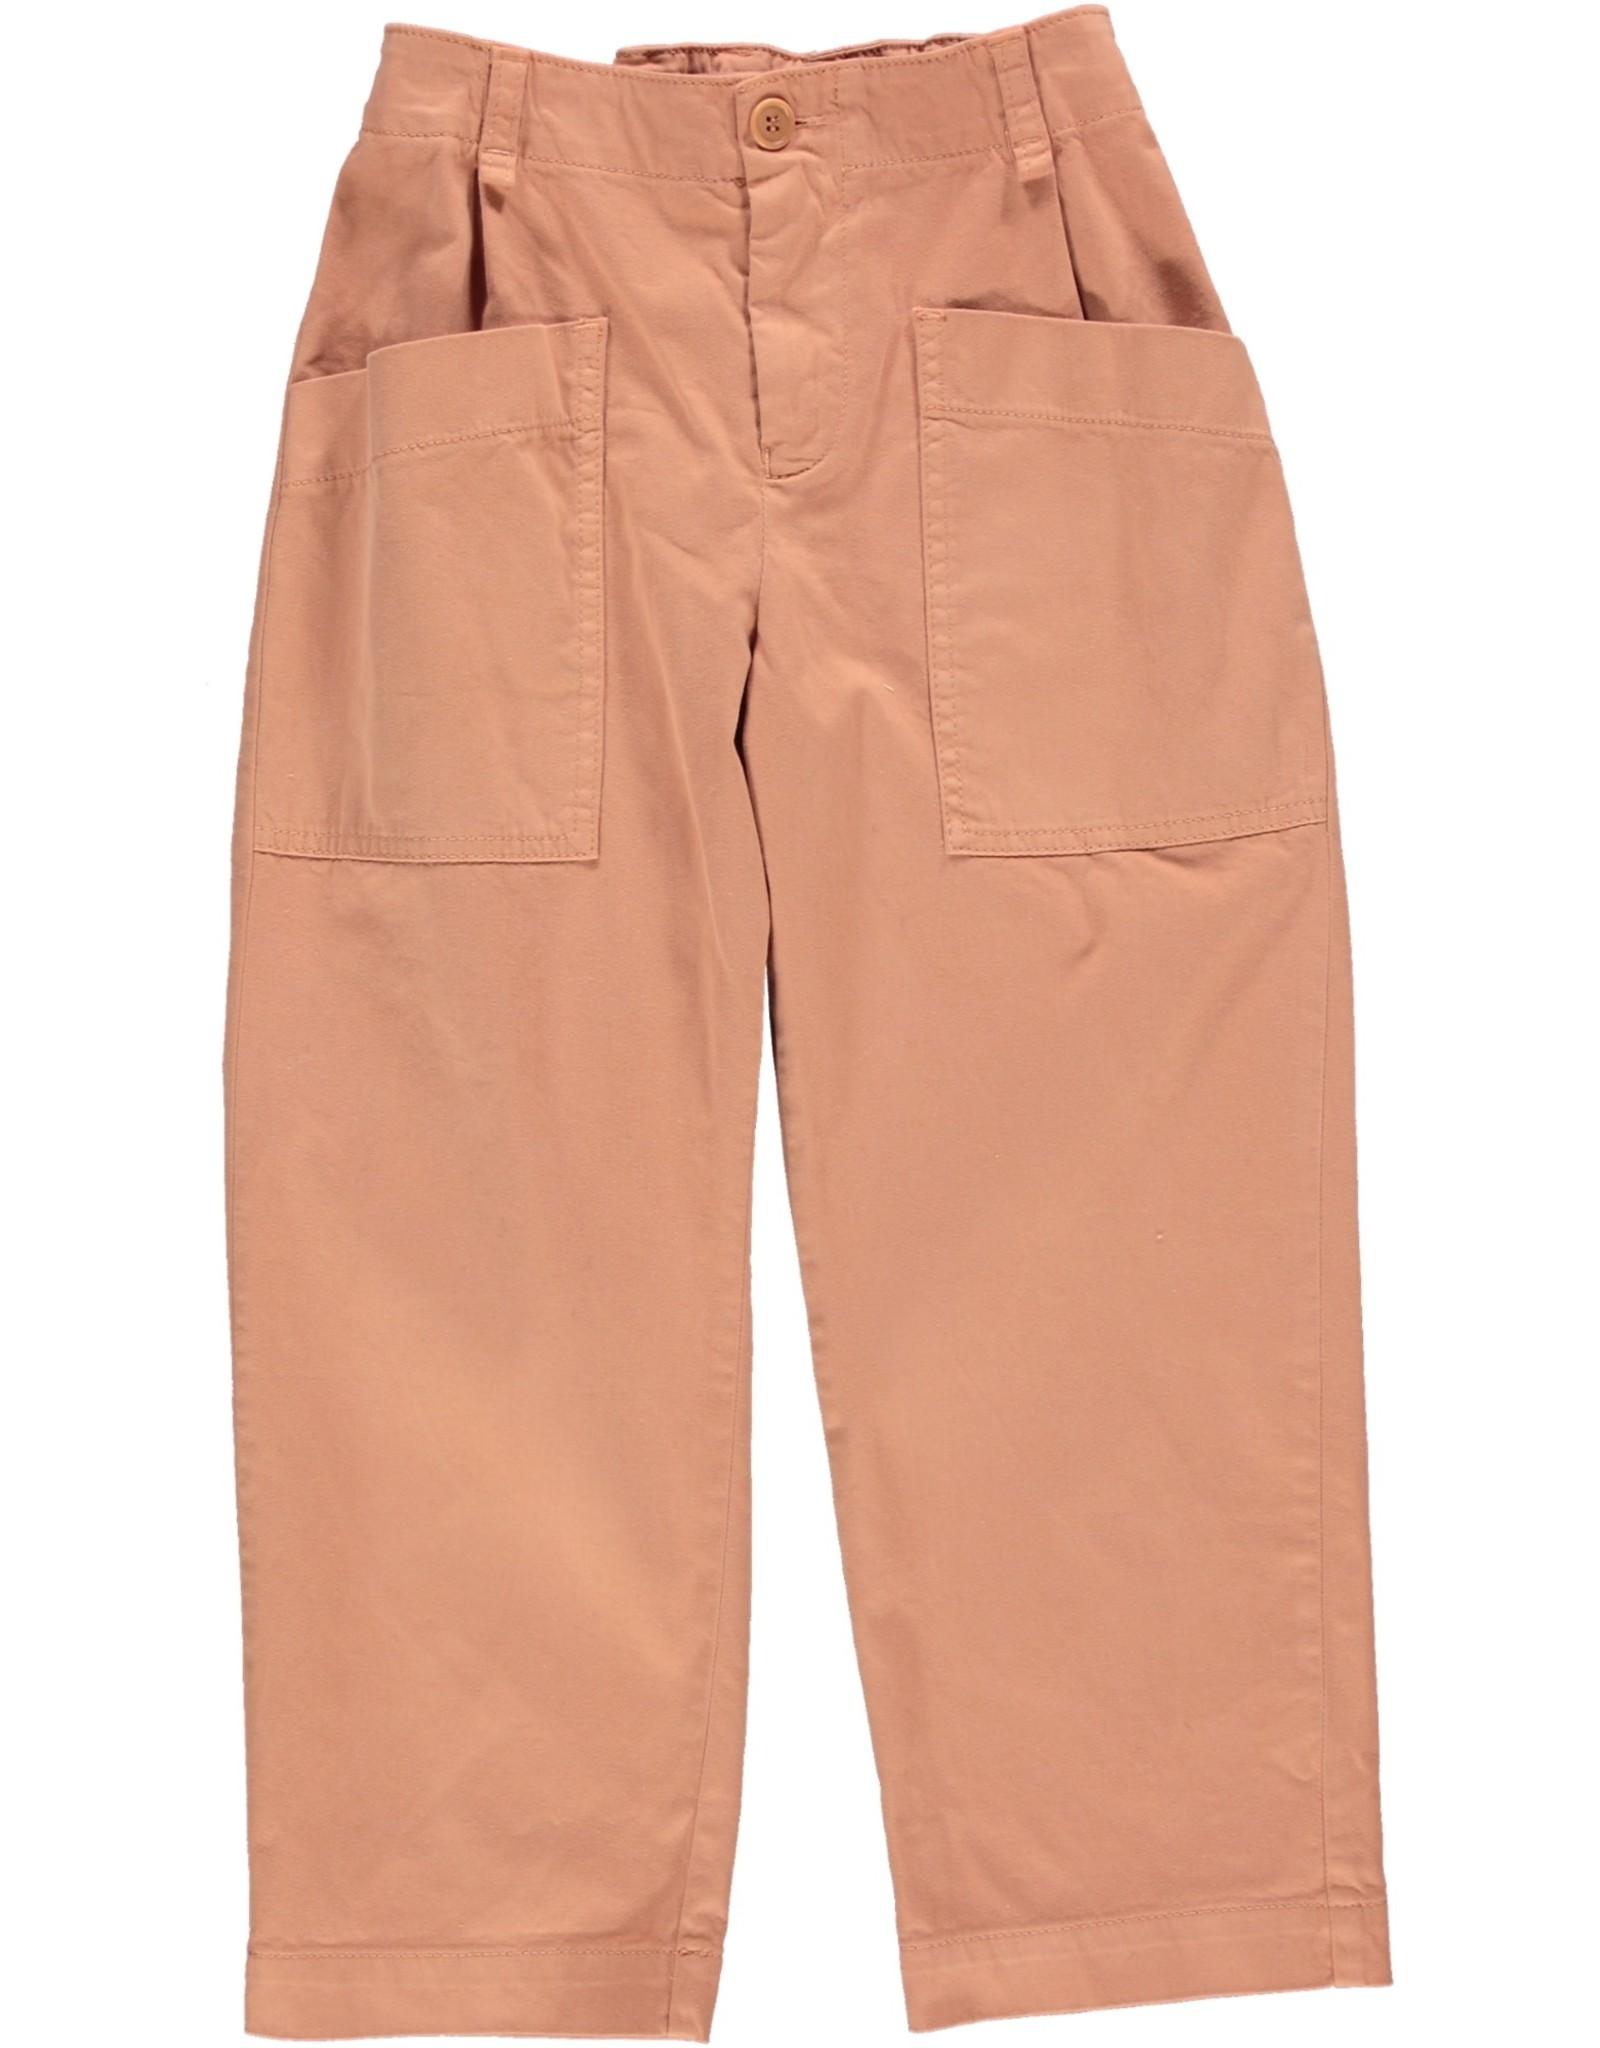 Maan FW21 Missy trousers caramel